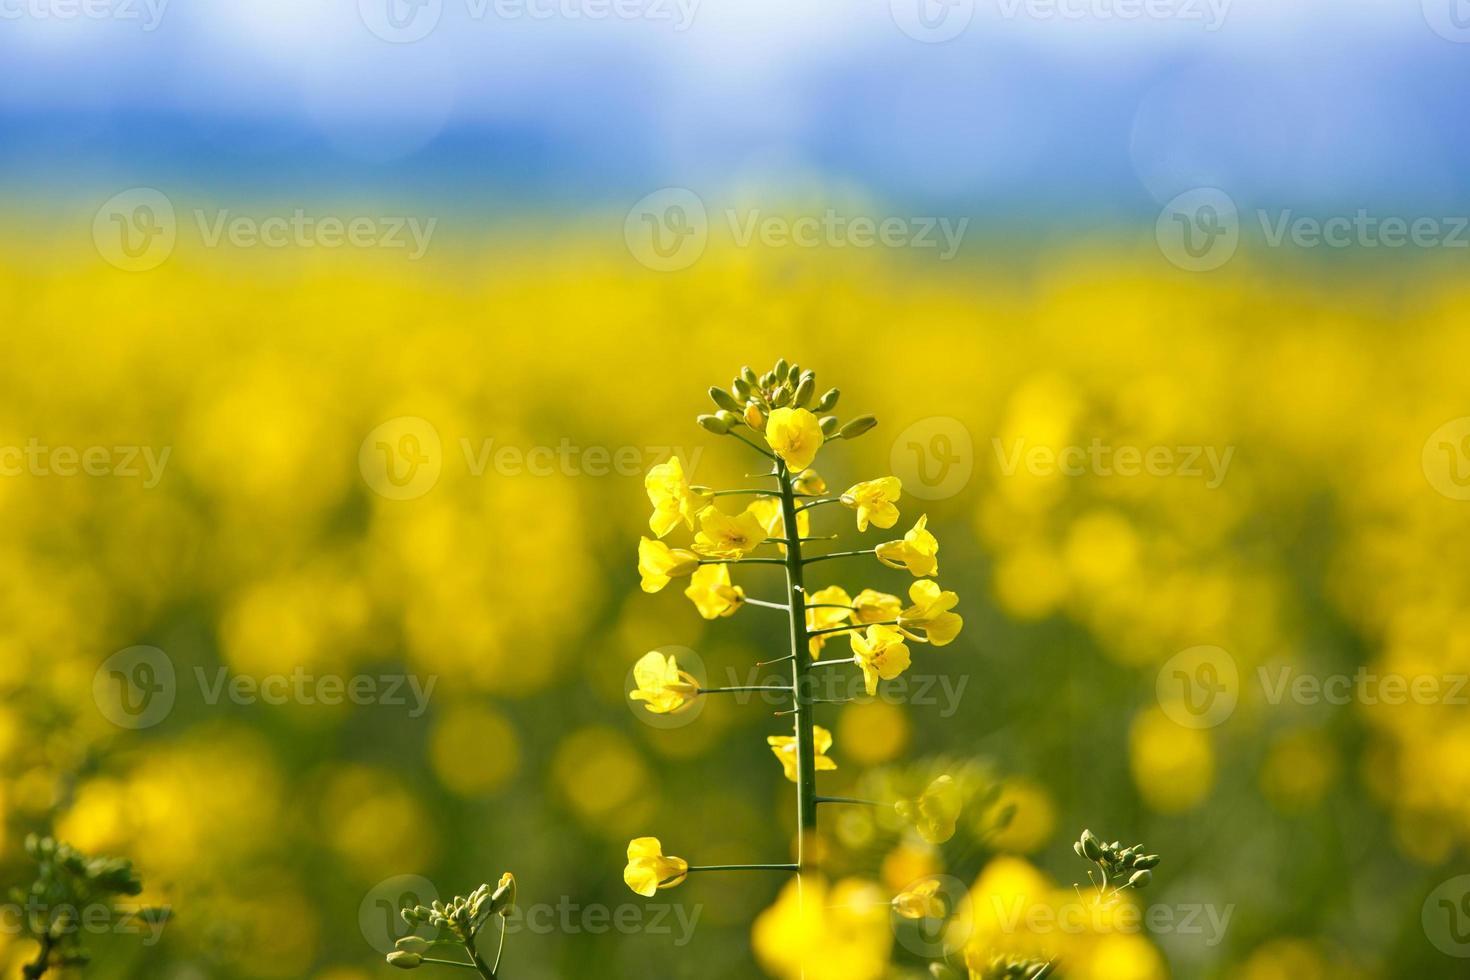 plante de colza photo